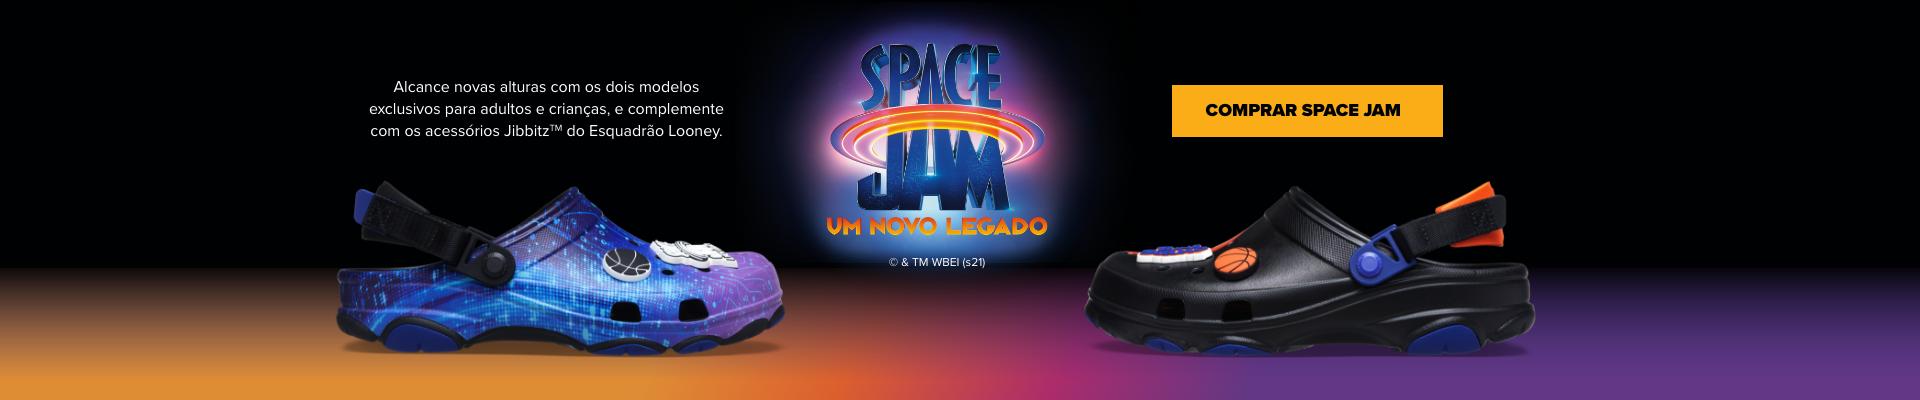 p5-space-jam-crocs